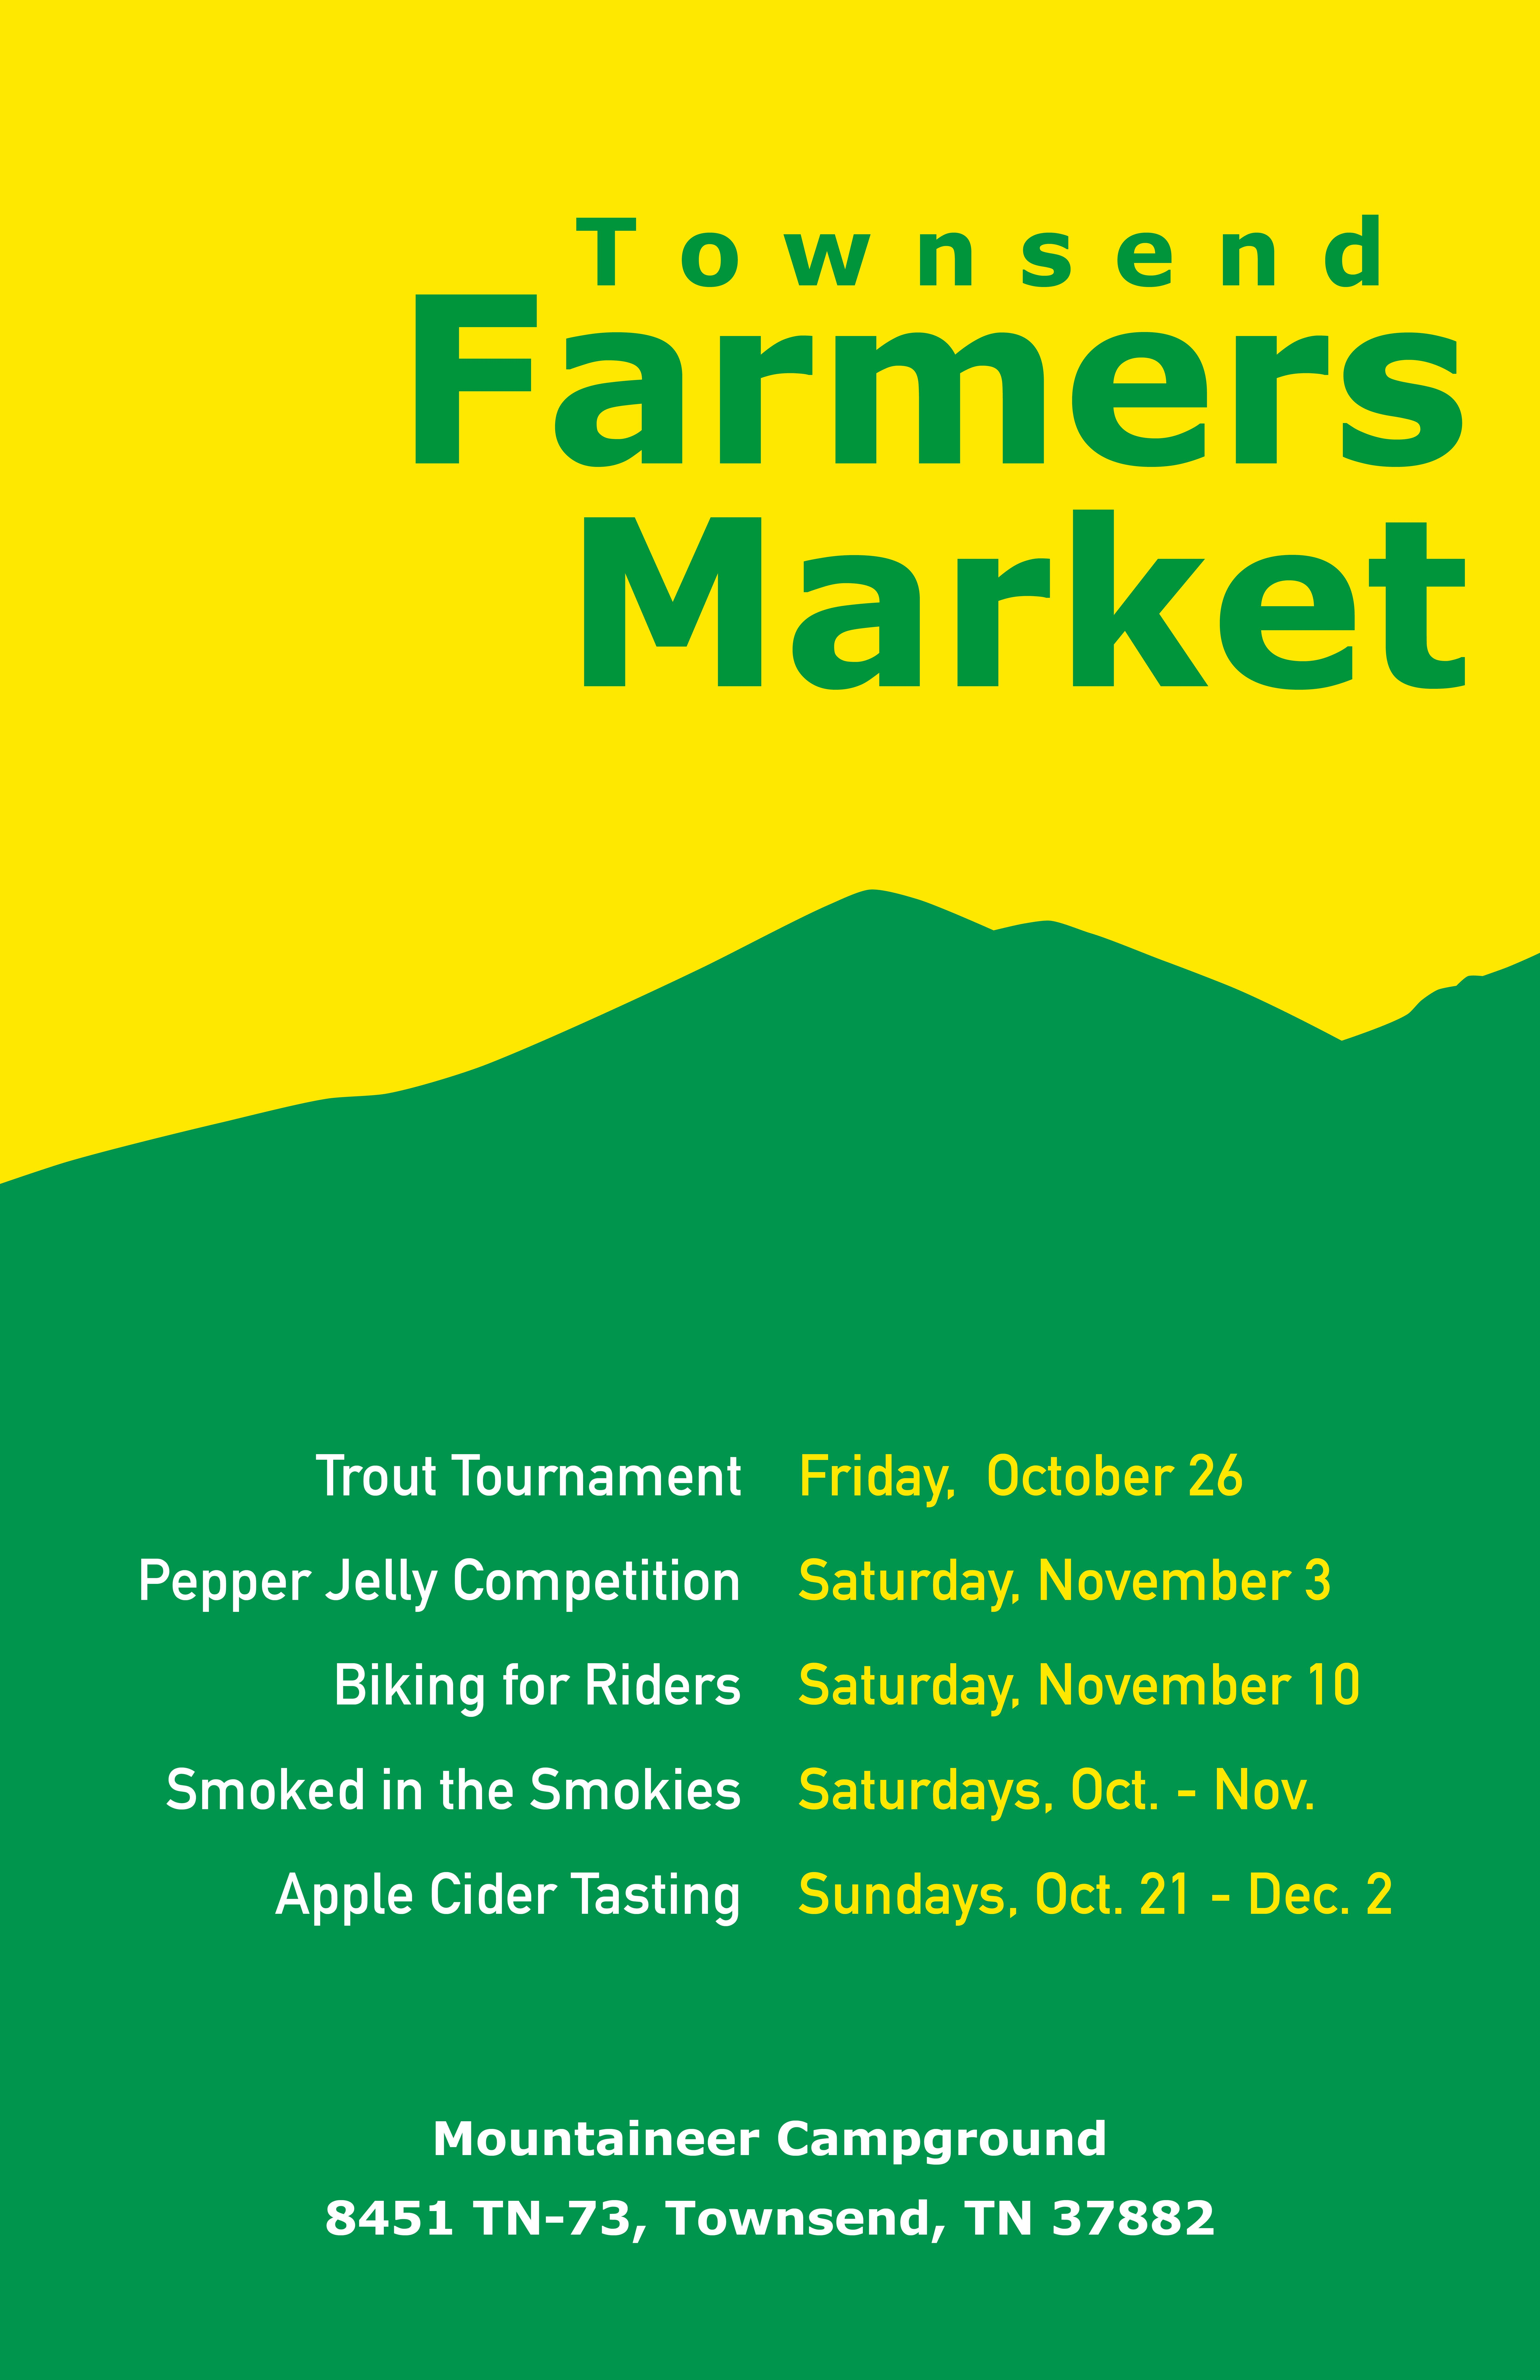 Townsend Farmers Market Poster | Toby Everett